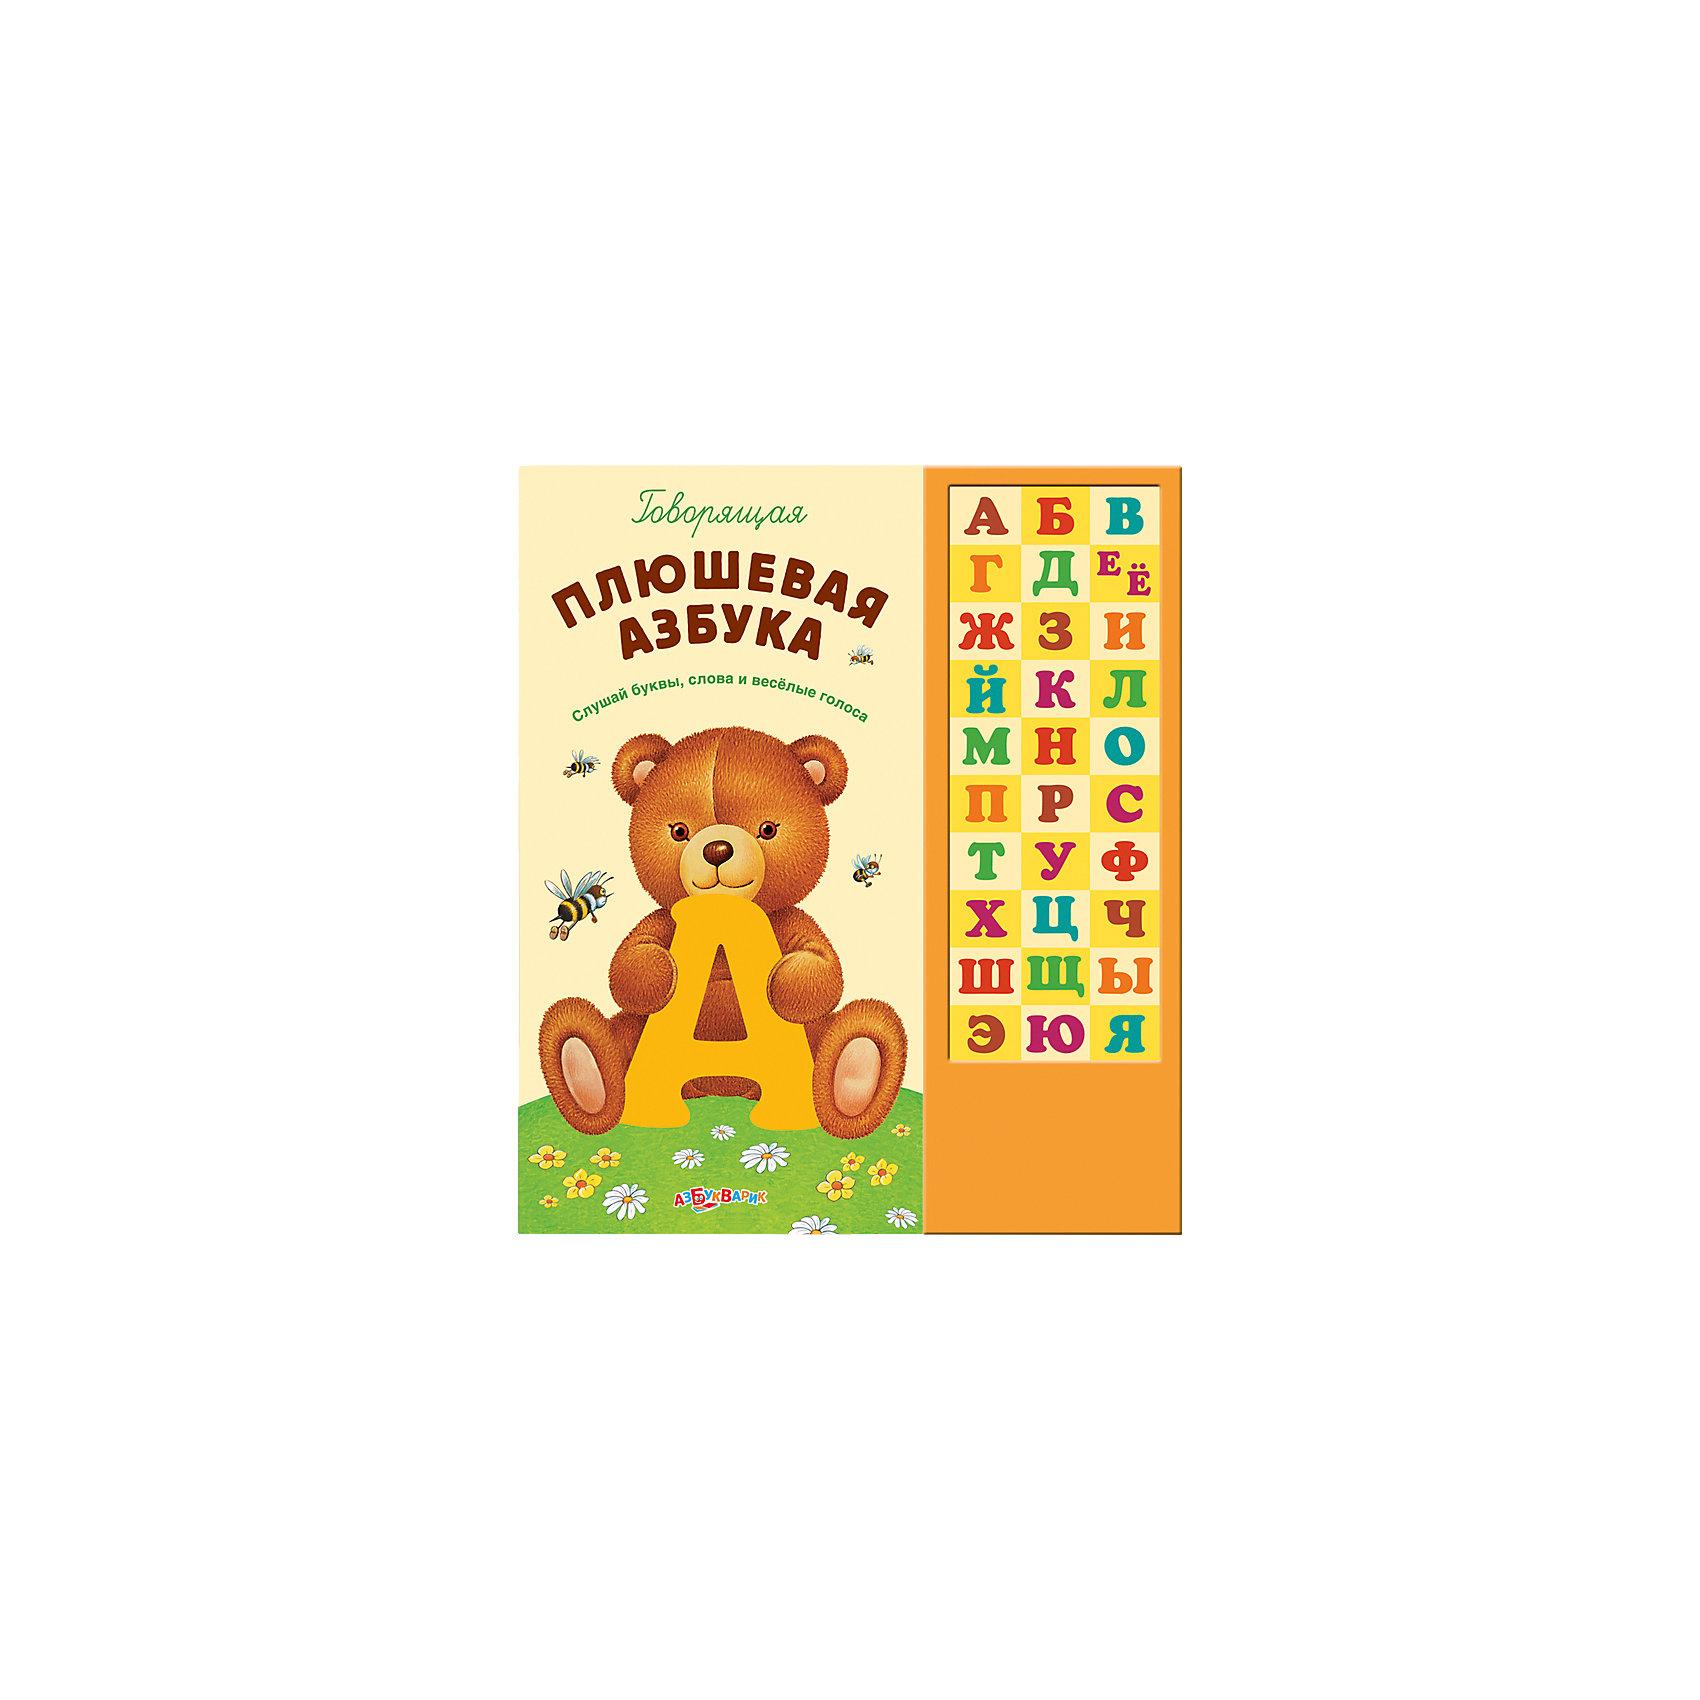 Азбукварик Книга Говорящая плюшевая азбука азбукварик говорящая умная азбука